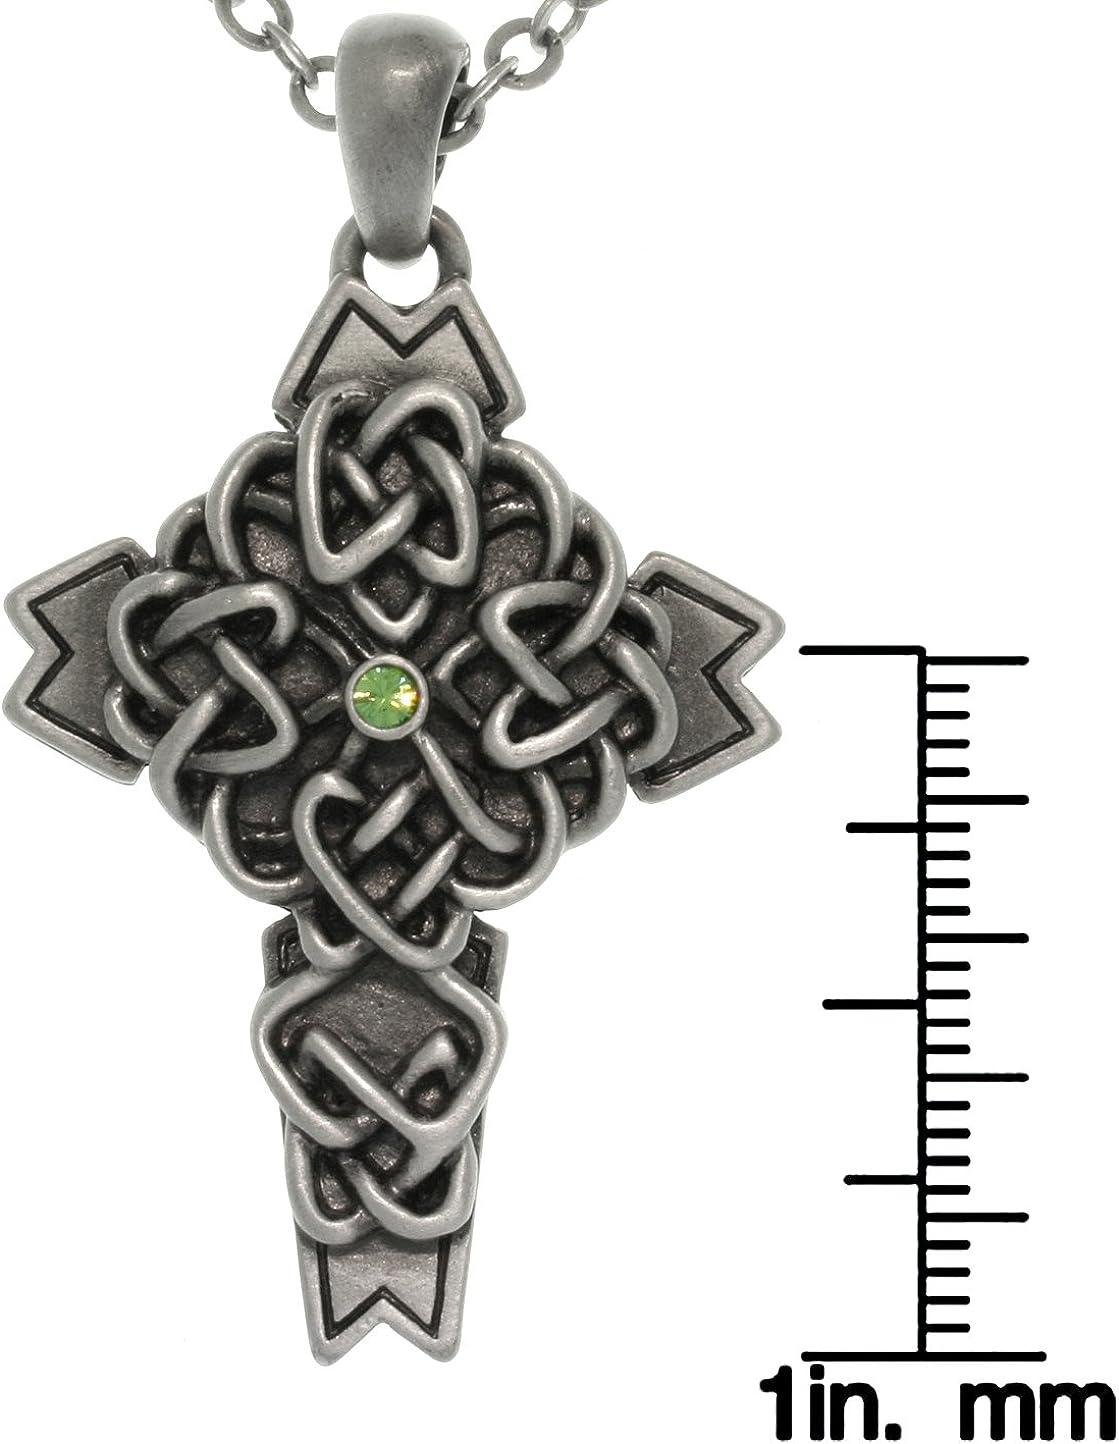 rini/_mc2 1 Pc Celtic Cross CZ 14K Gold Plated Surgical Steel Helix Tragus Cartilage Bar Stud